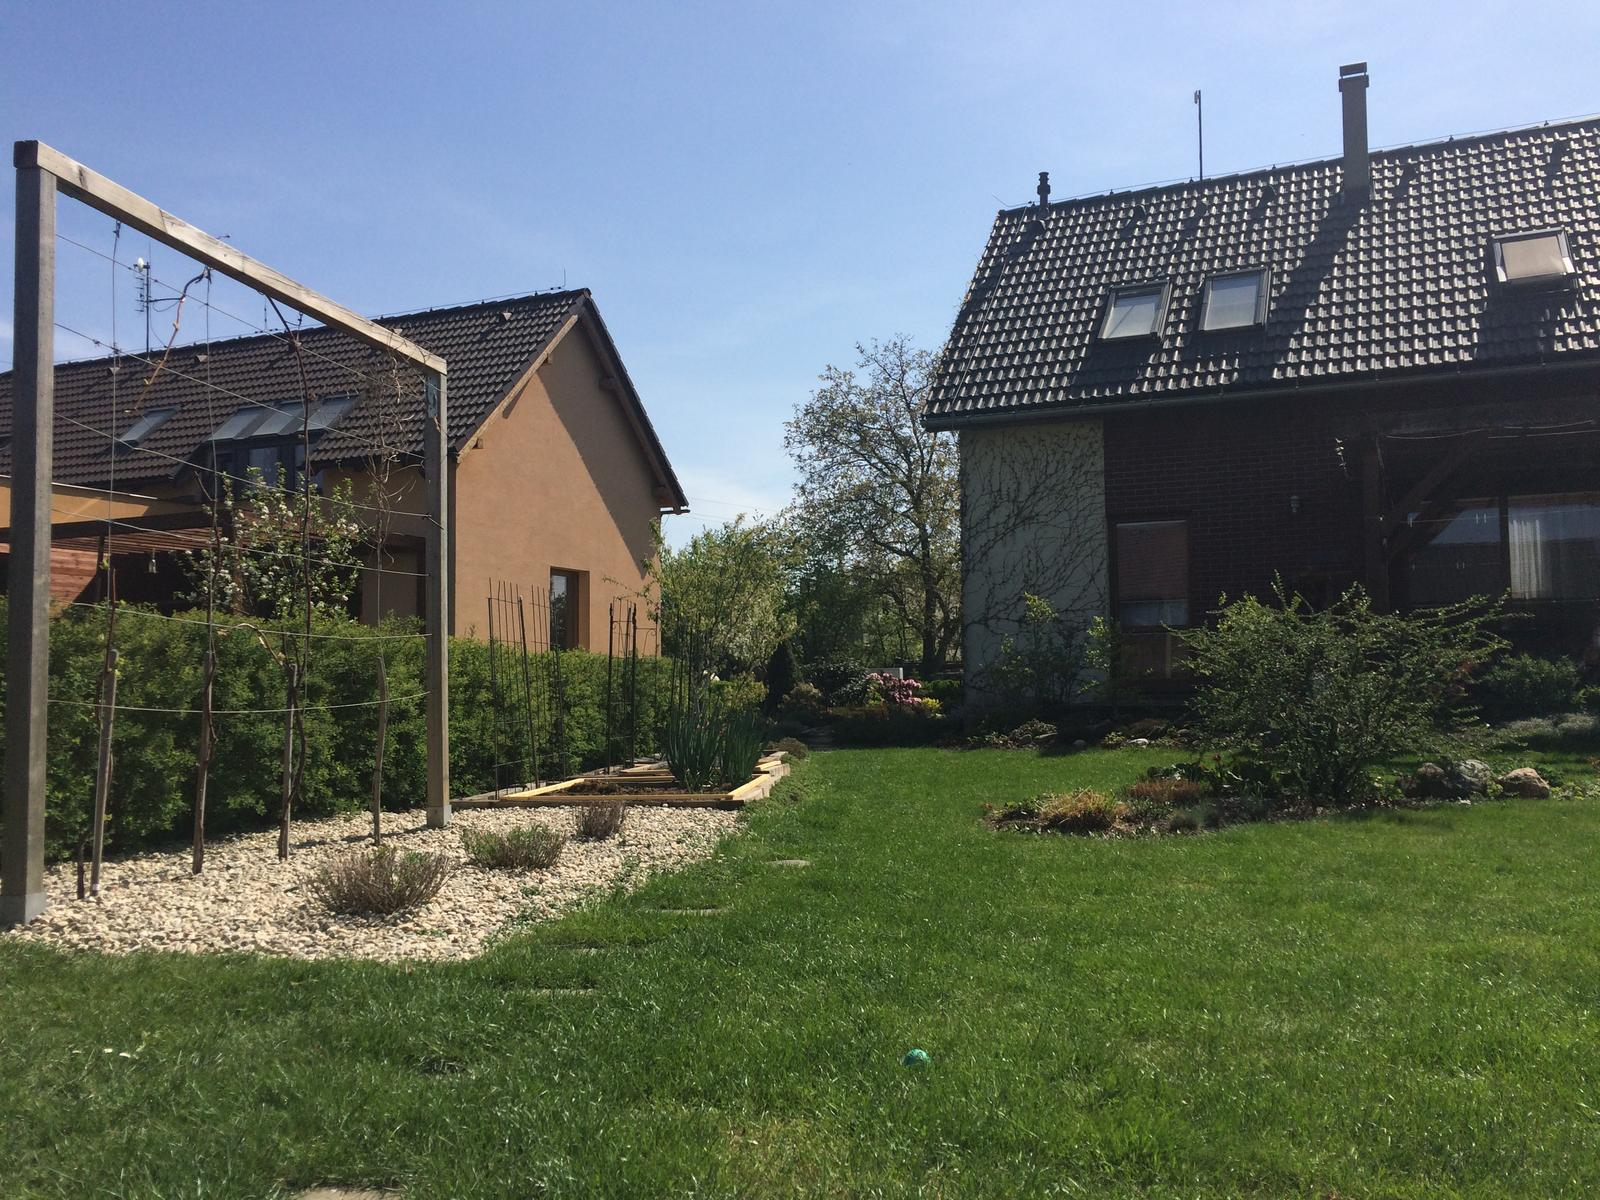 Zahrada 2018 - Obrázek č. 84